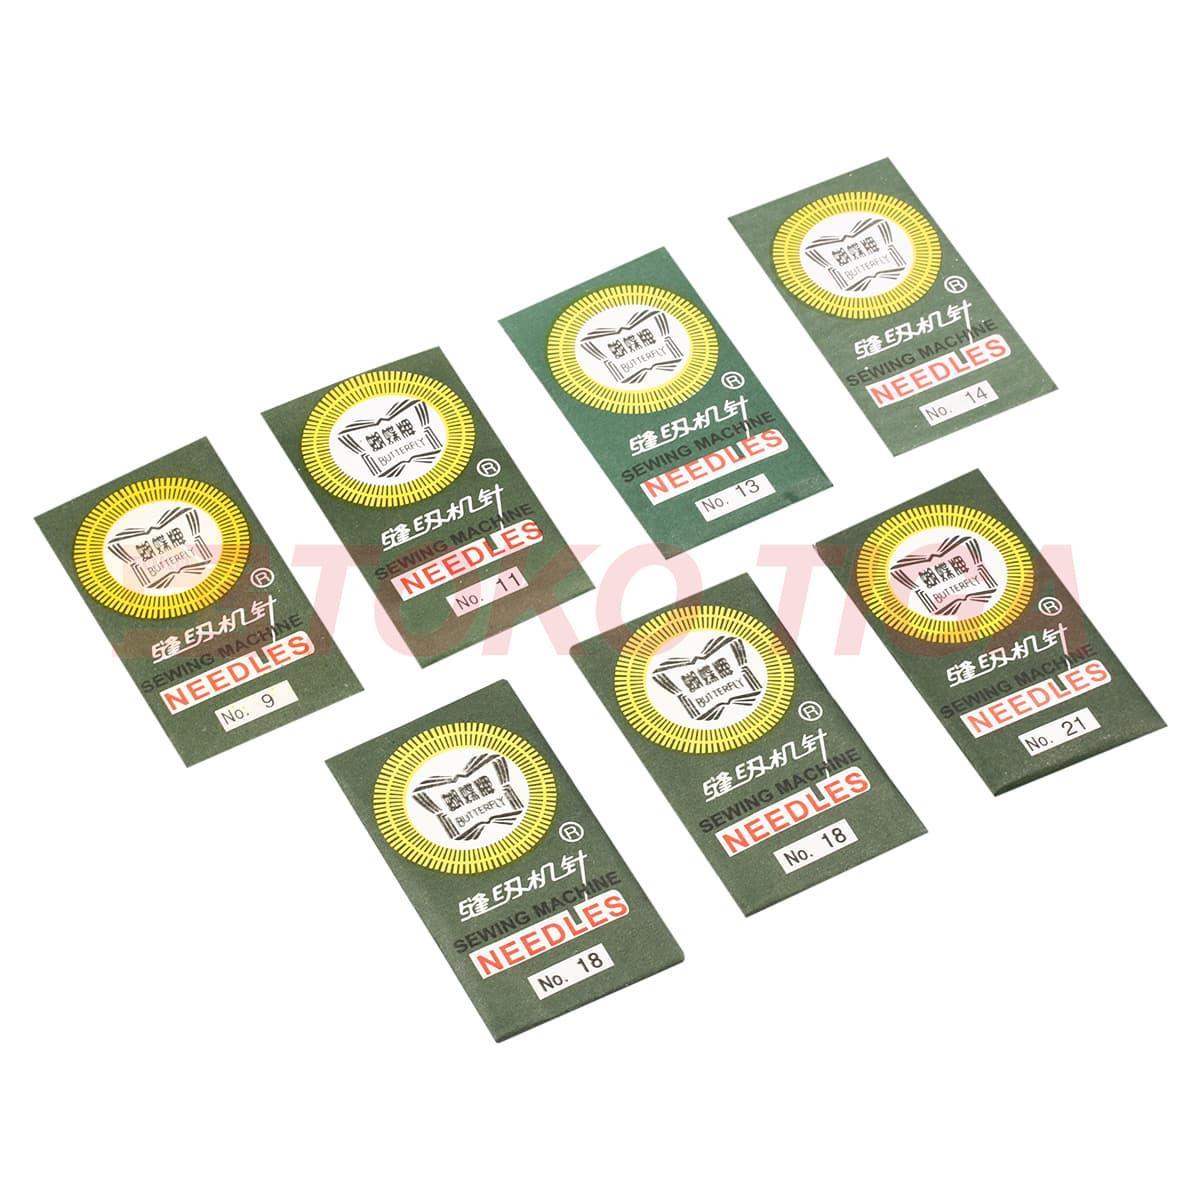 PROMO!! TERMURAH Jarum Mesin Jahit Merk BUTTERFLY Portable & Multifungsi